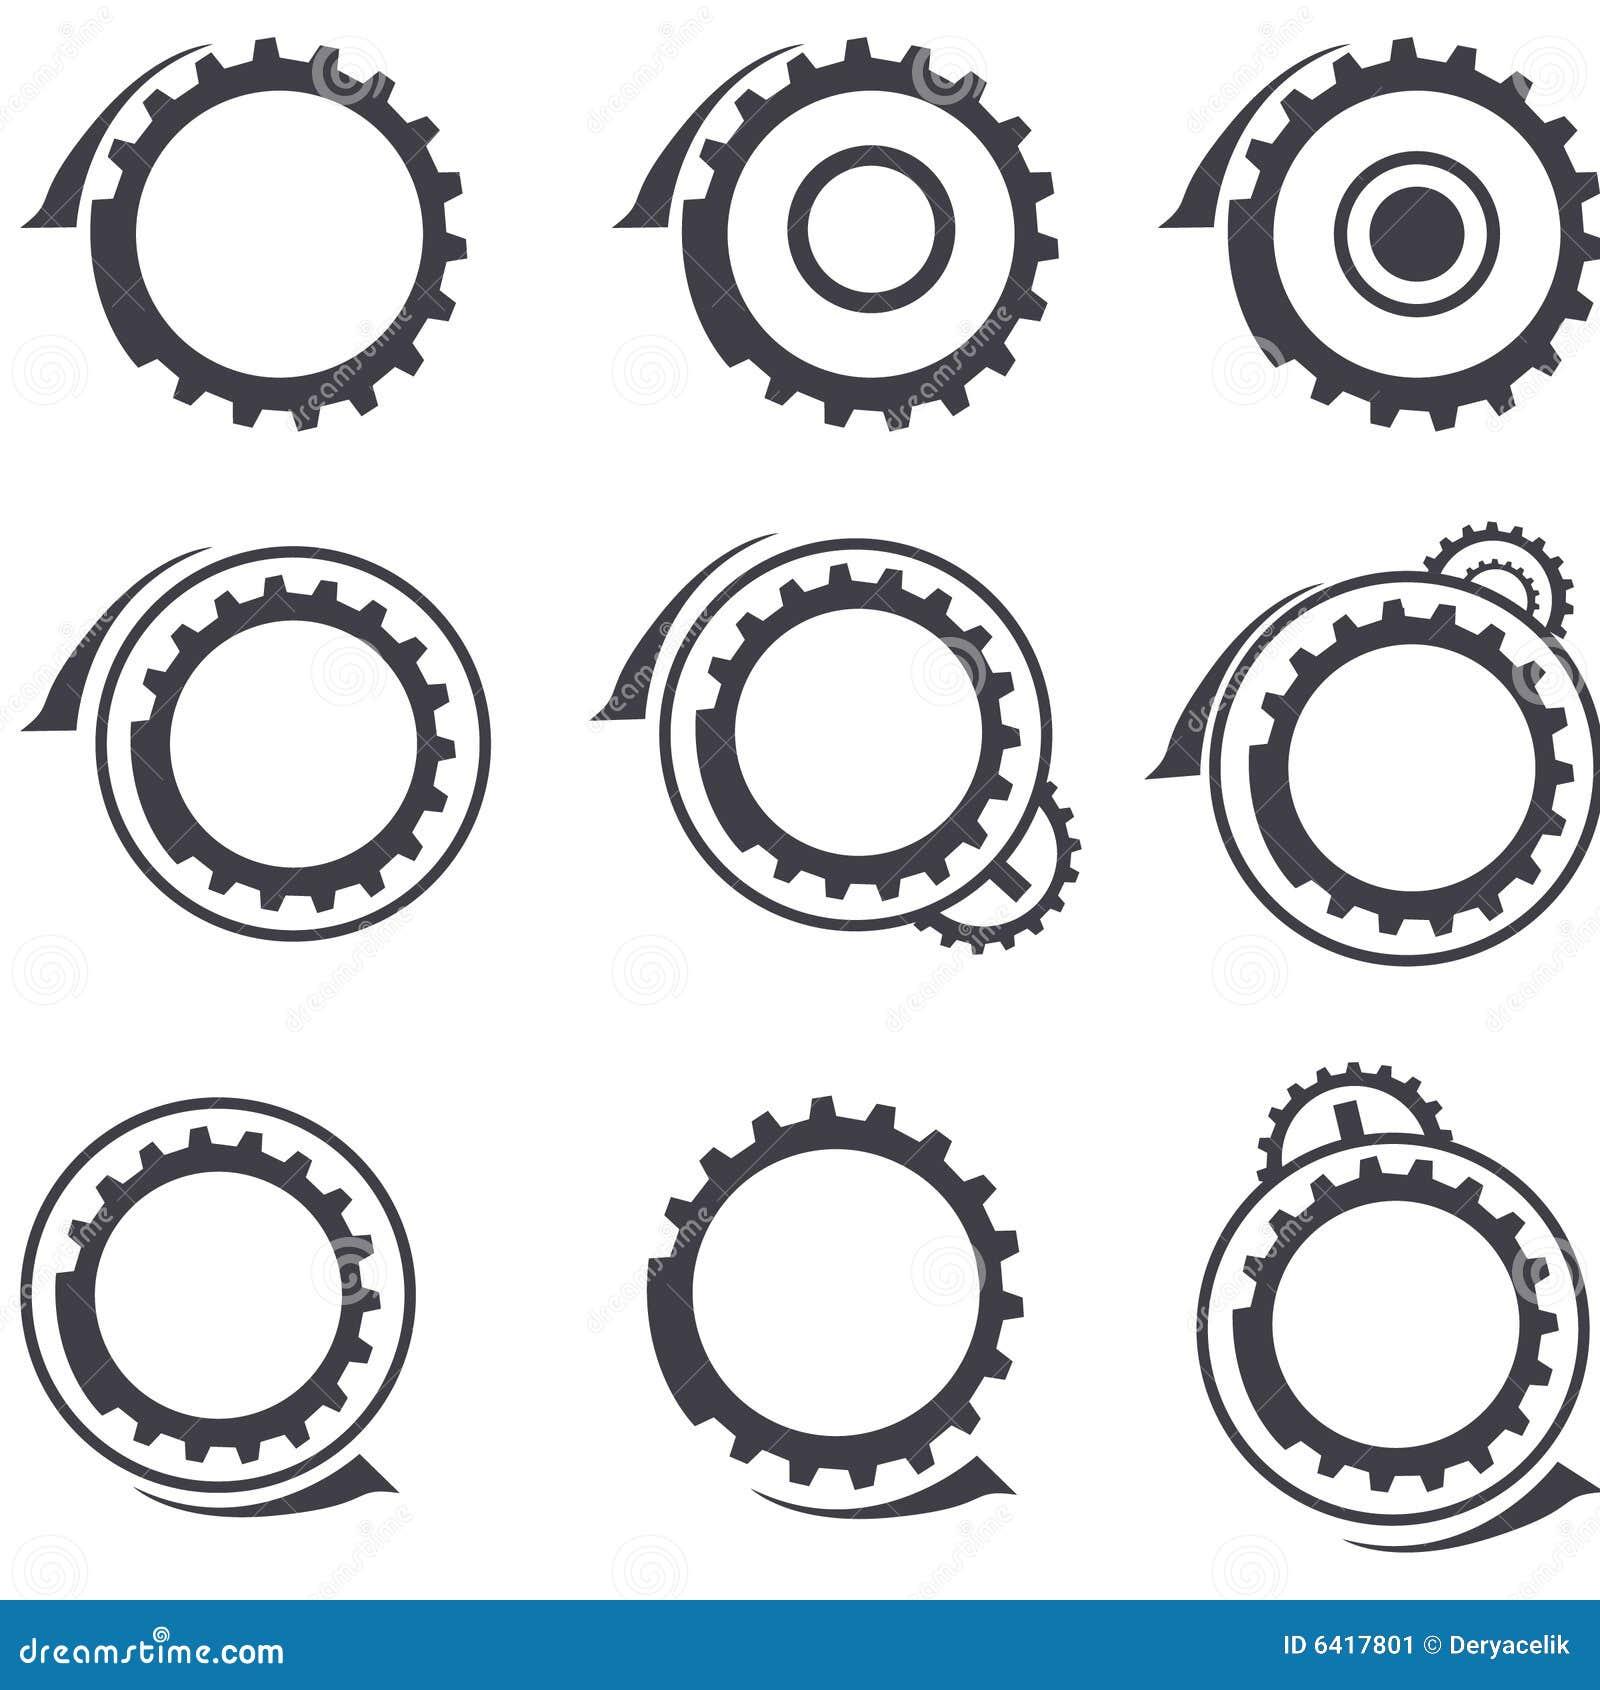 Vector graphic design business logo - Gear Wheels Vector Logos And Graphic Design Elemen